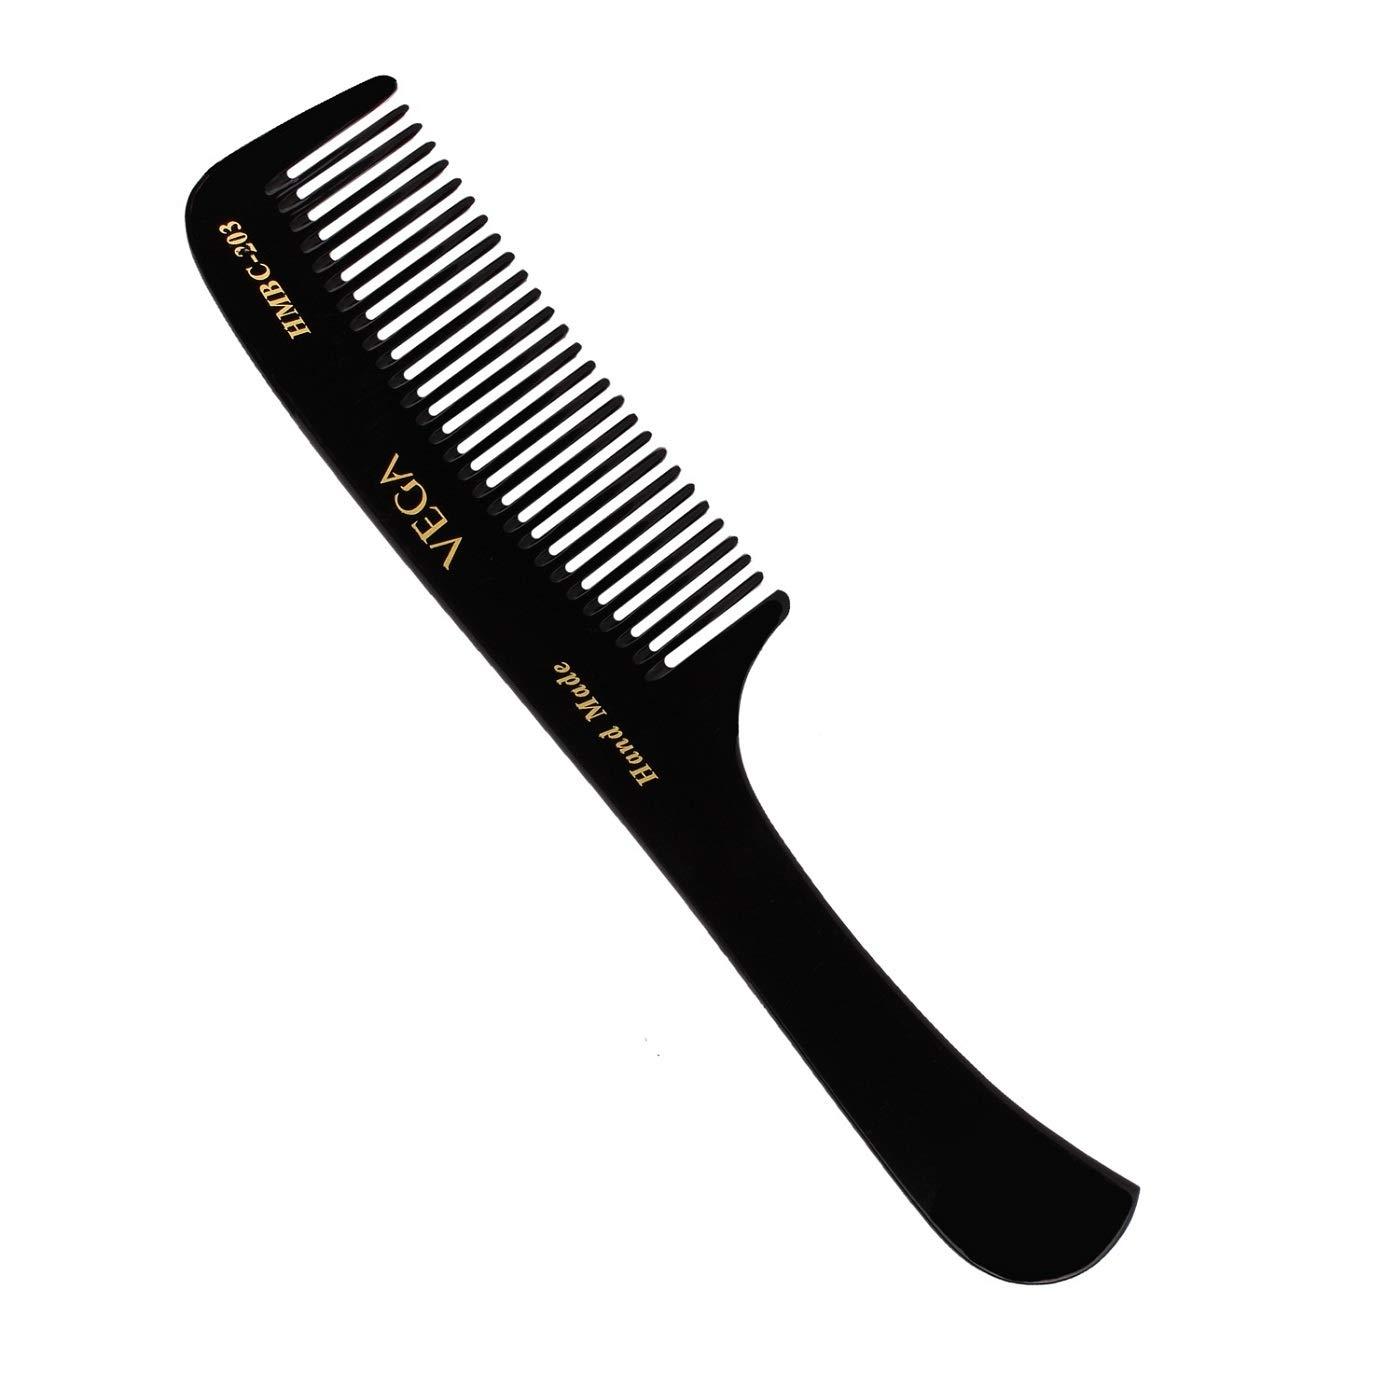 Vega Handmade Black Comb - Grooming HMBC-203 1 Pcs by Vega Product